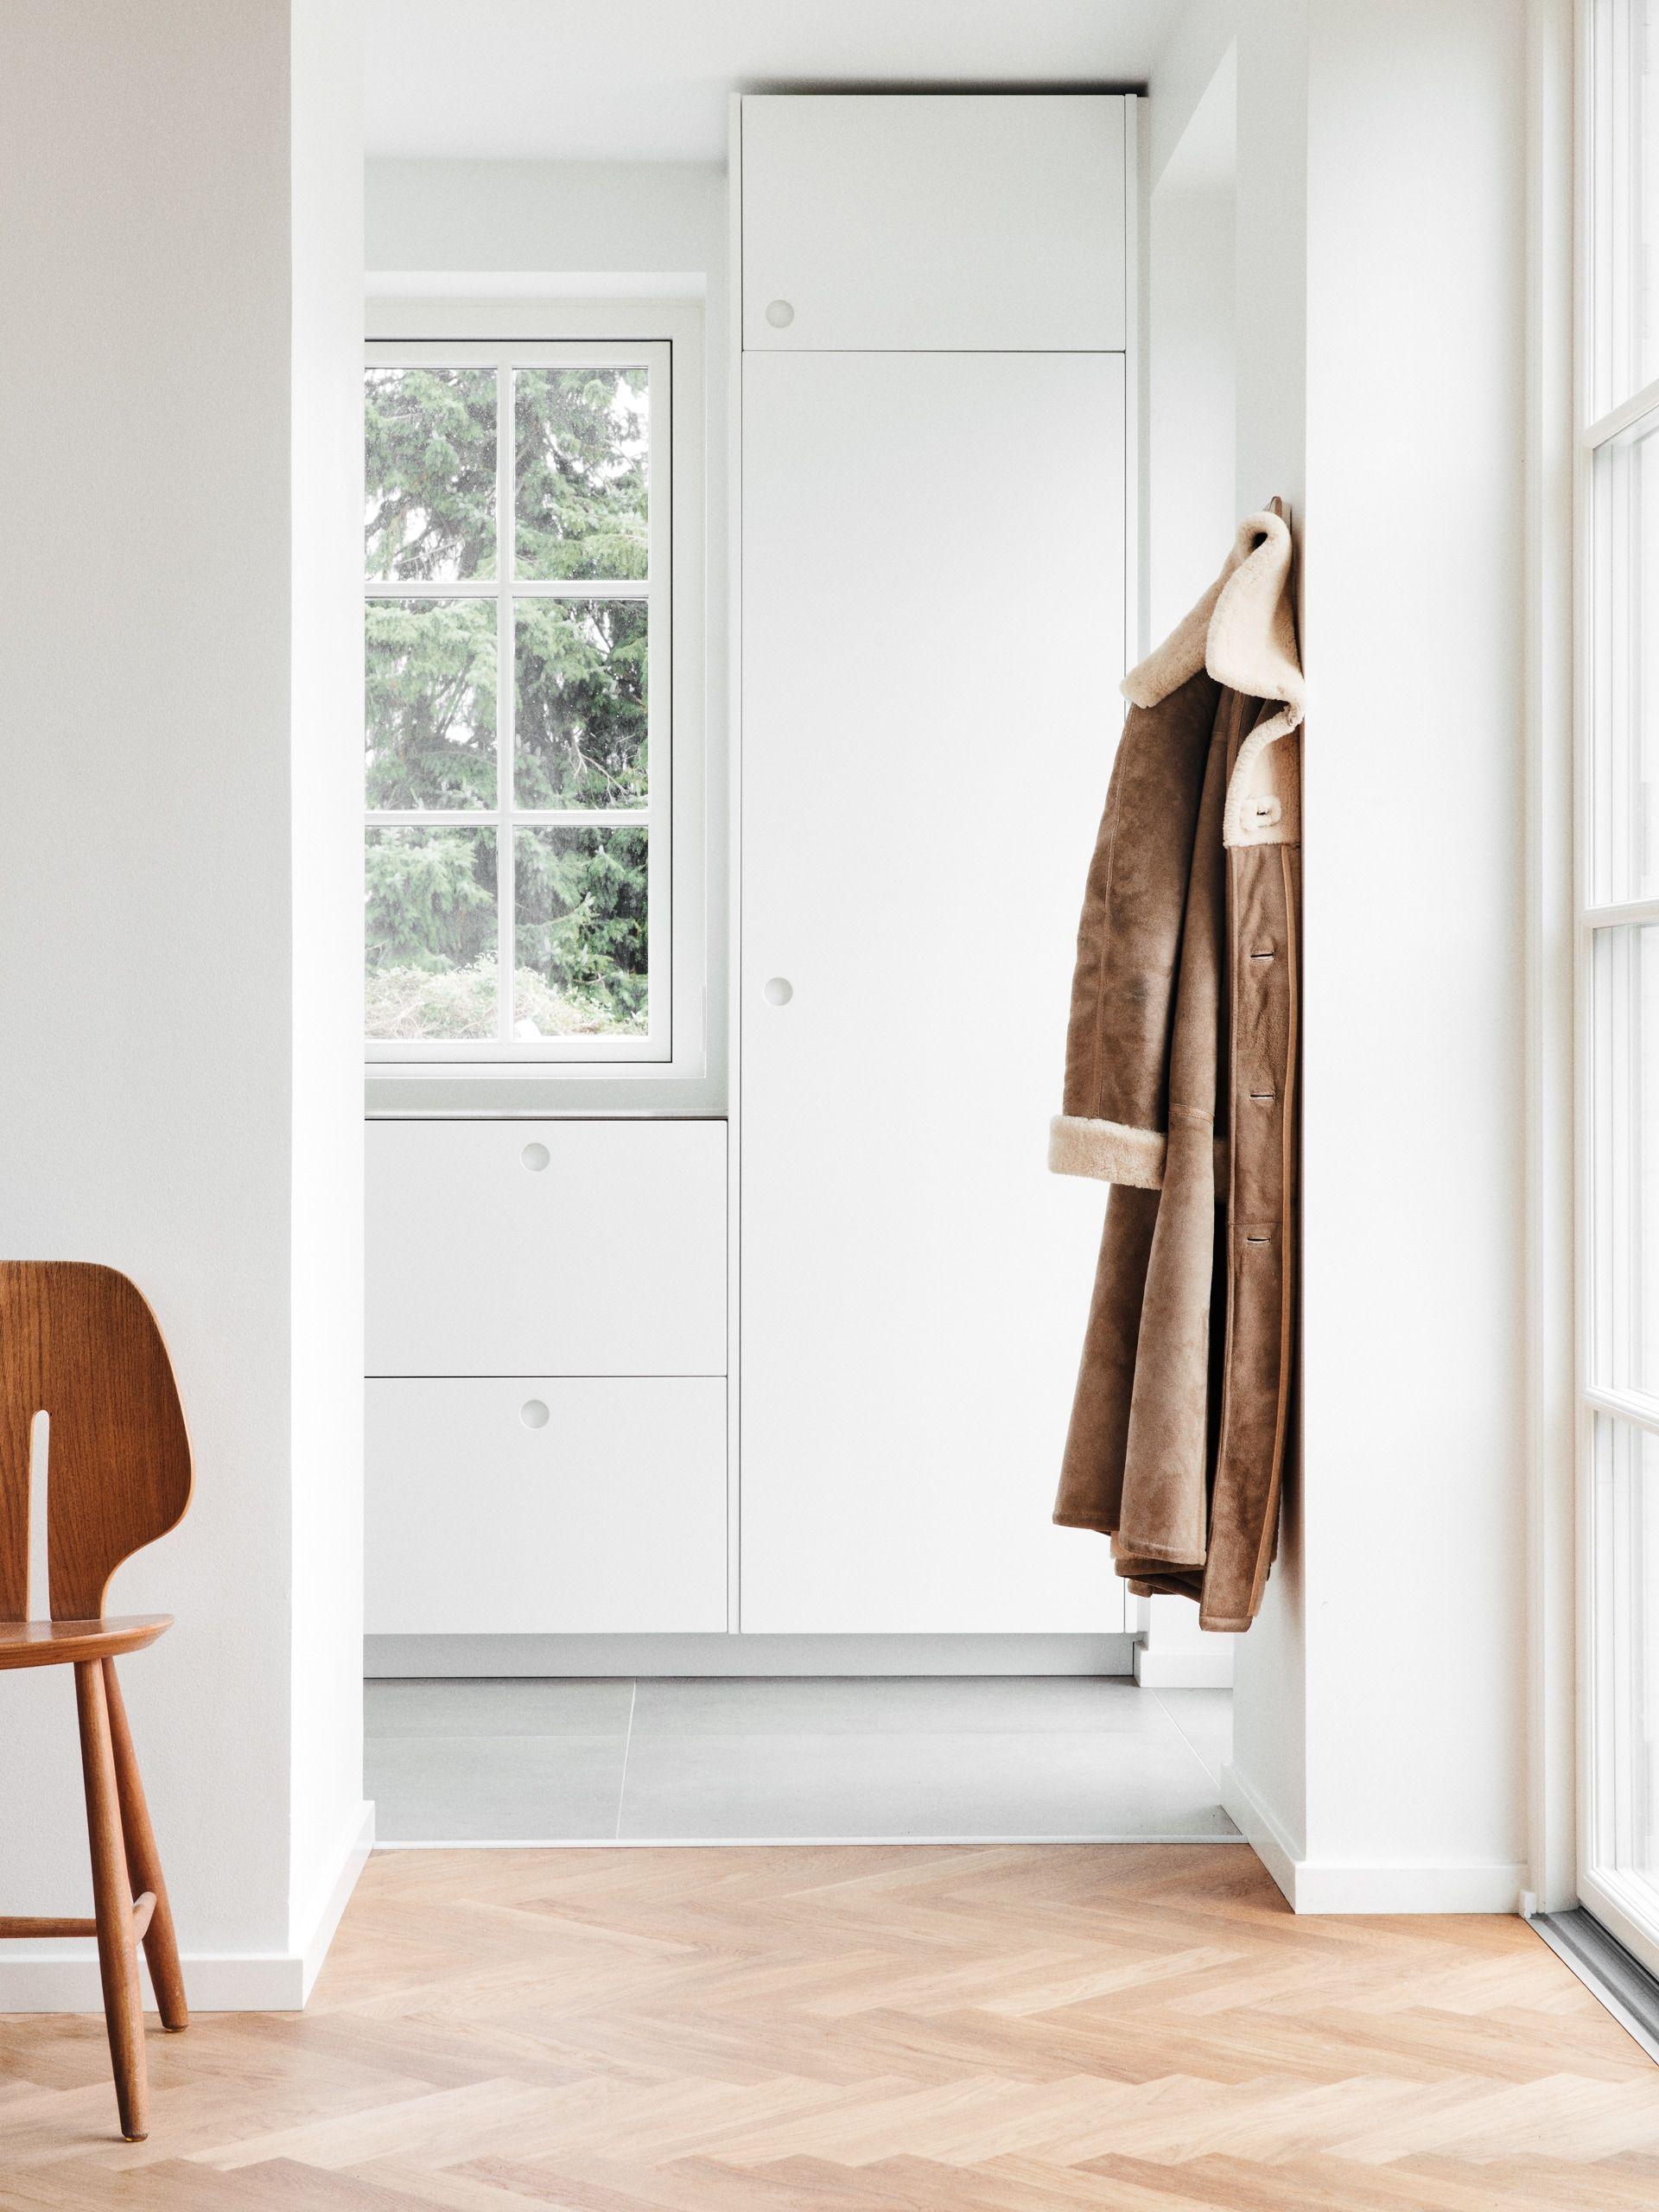 Inspiration Vedbæk in North Zealand, Denmark in 2020